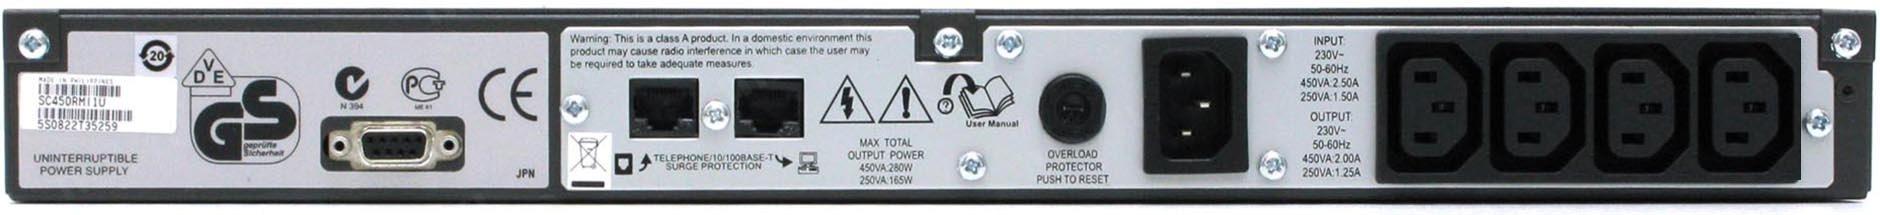 APC-by-Schneider-Electric-Smart-UPS-SC450RMI1U-Rear